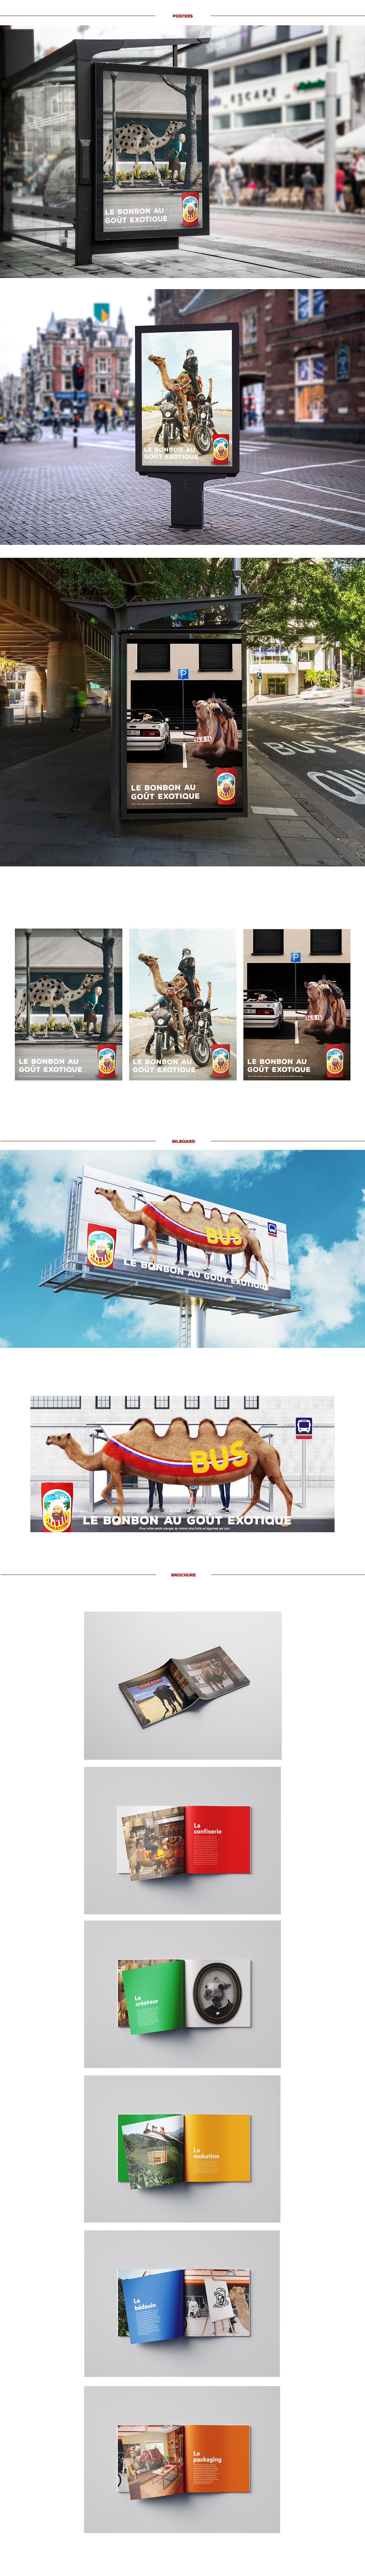 rebranding branding  student ILLUSTRATION  pub Advertising  posters Fun camel funny